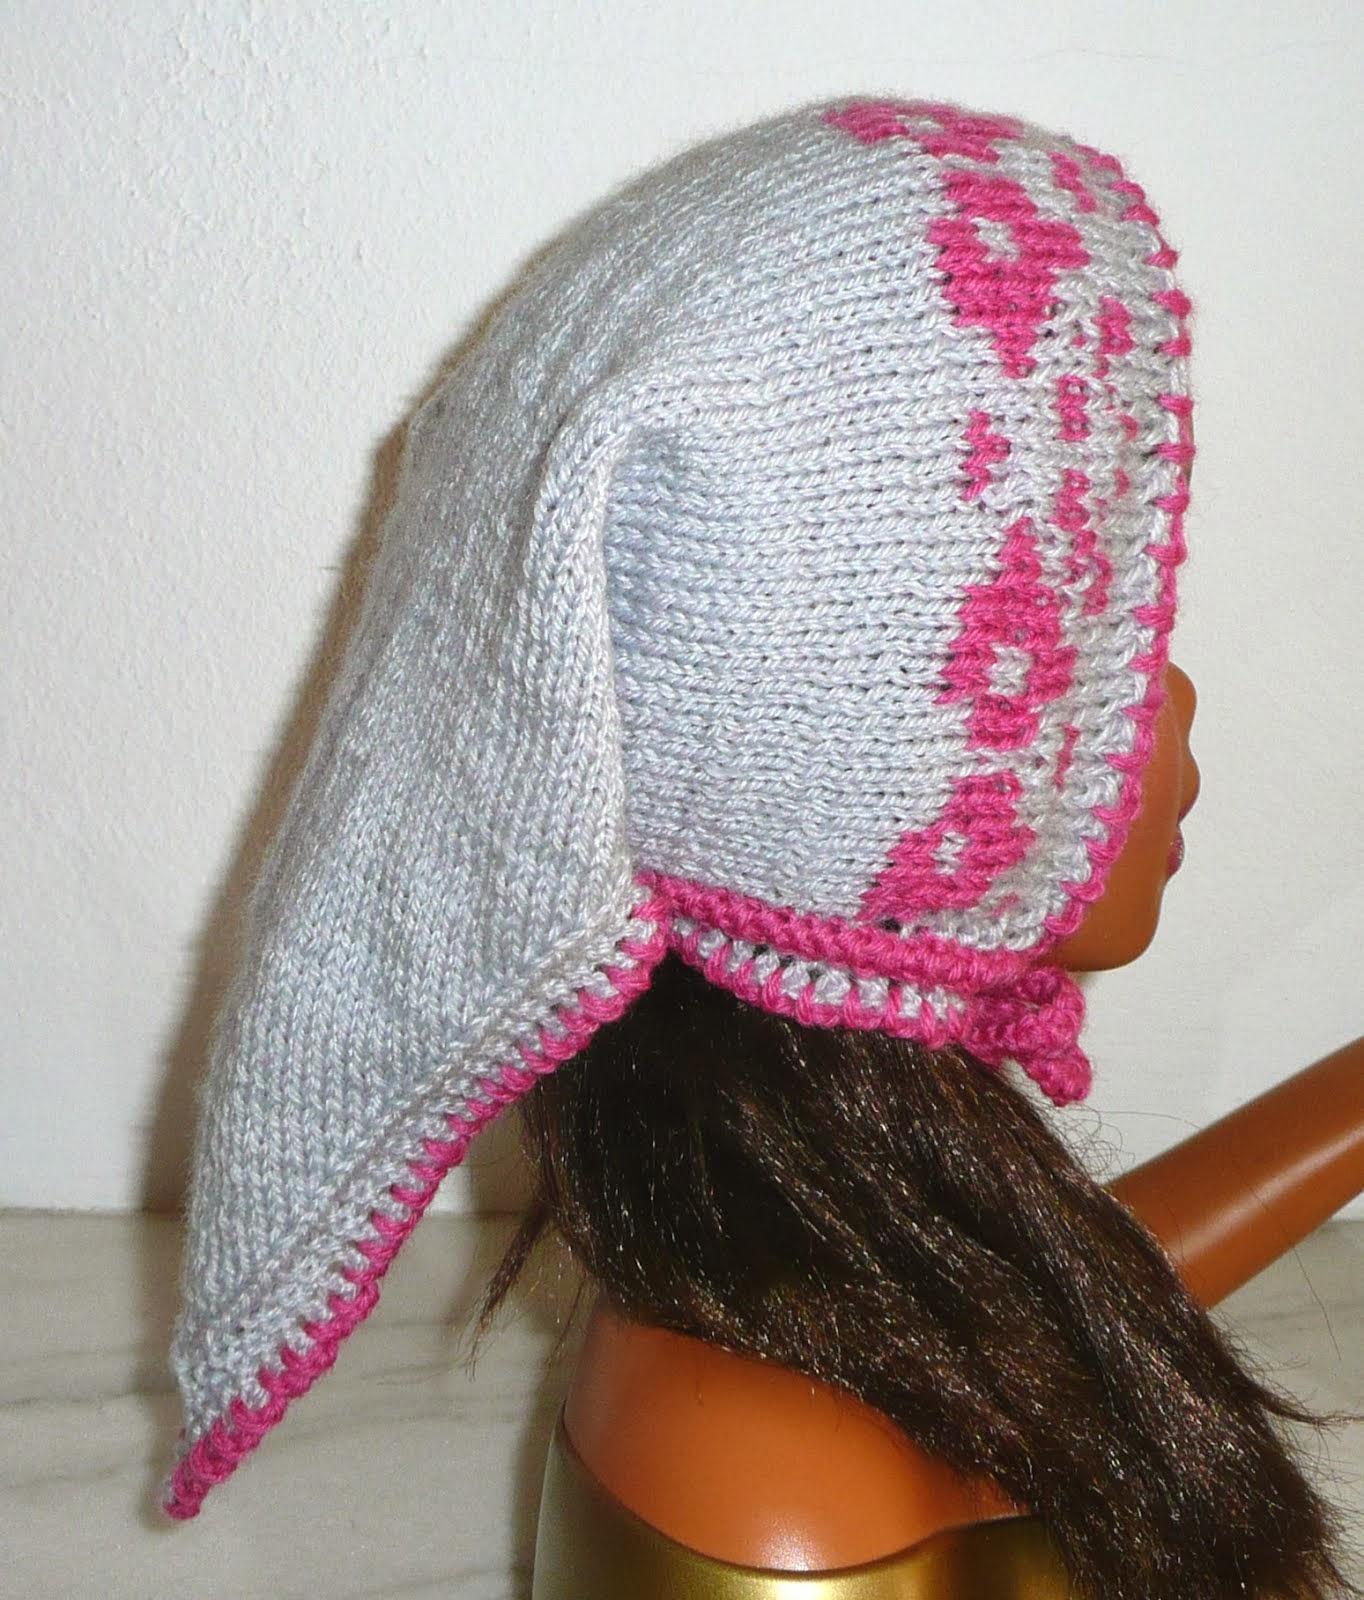 Batic tricotat